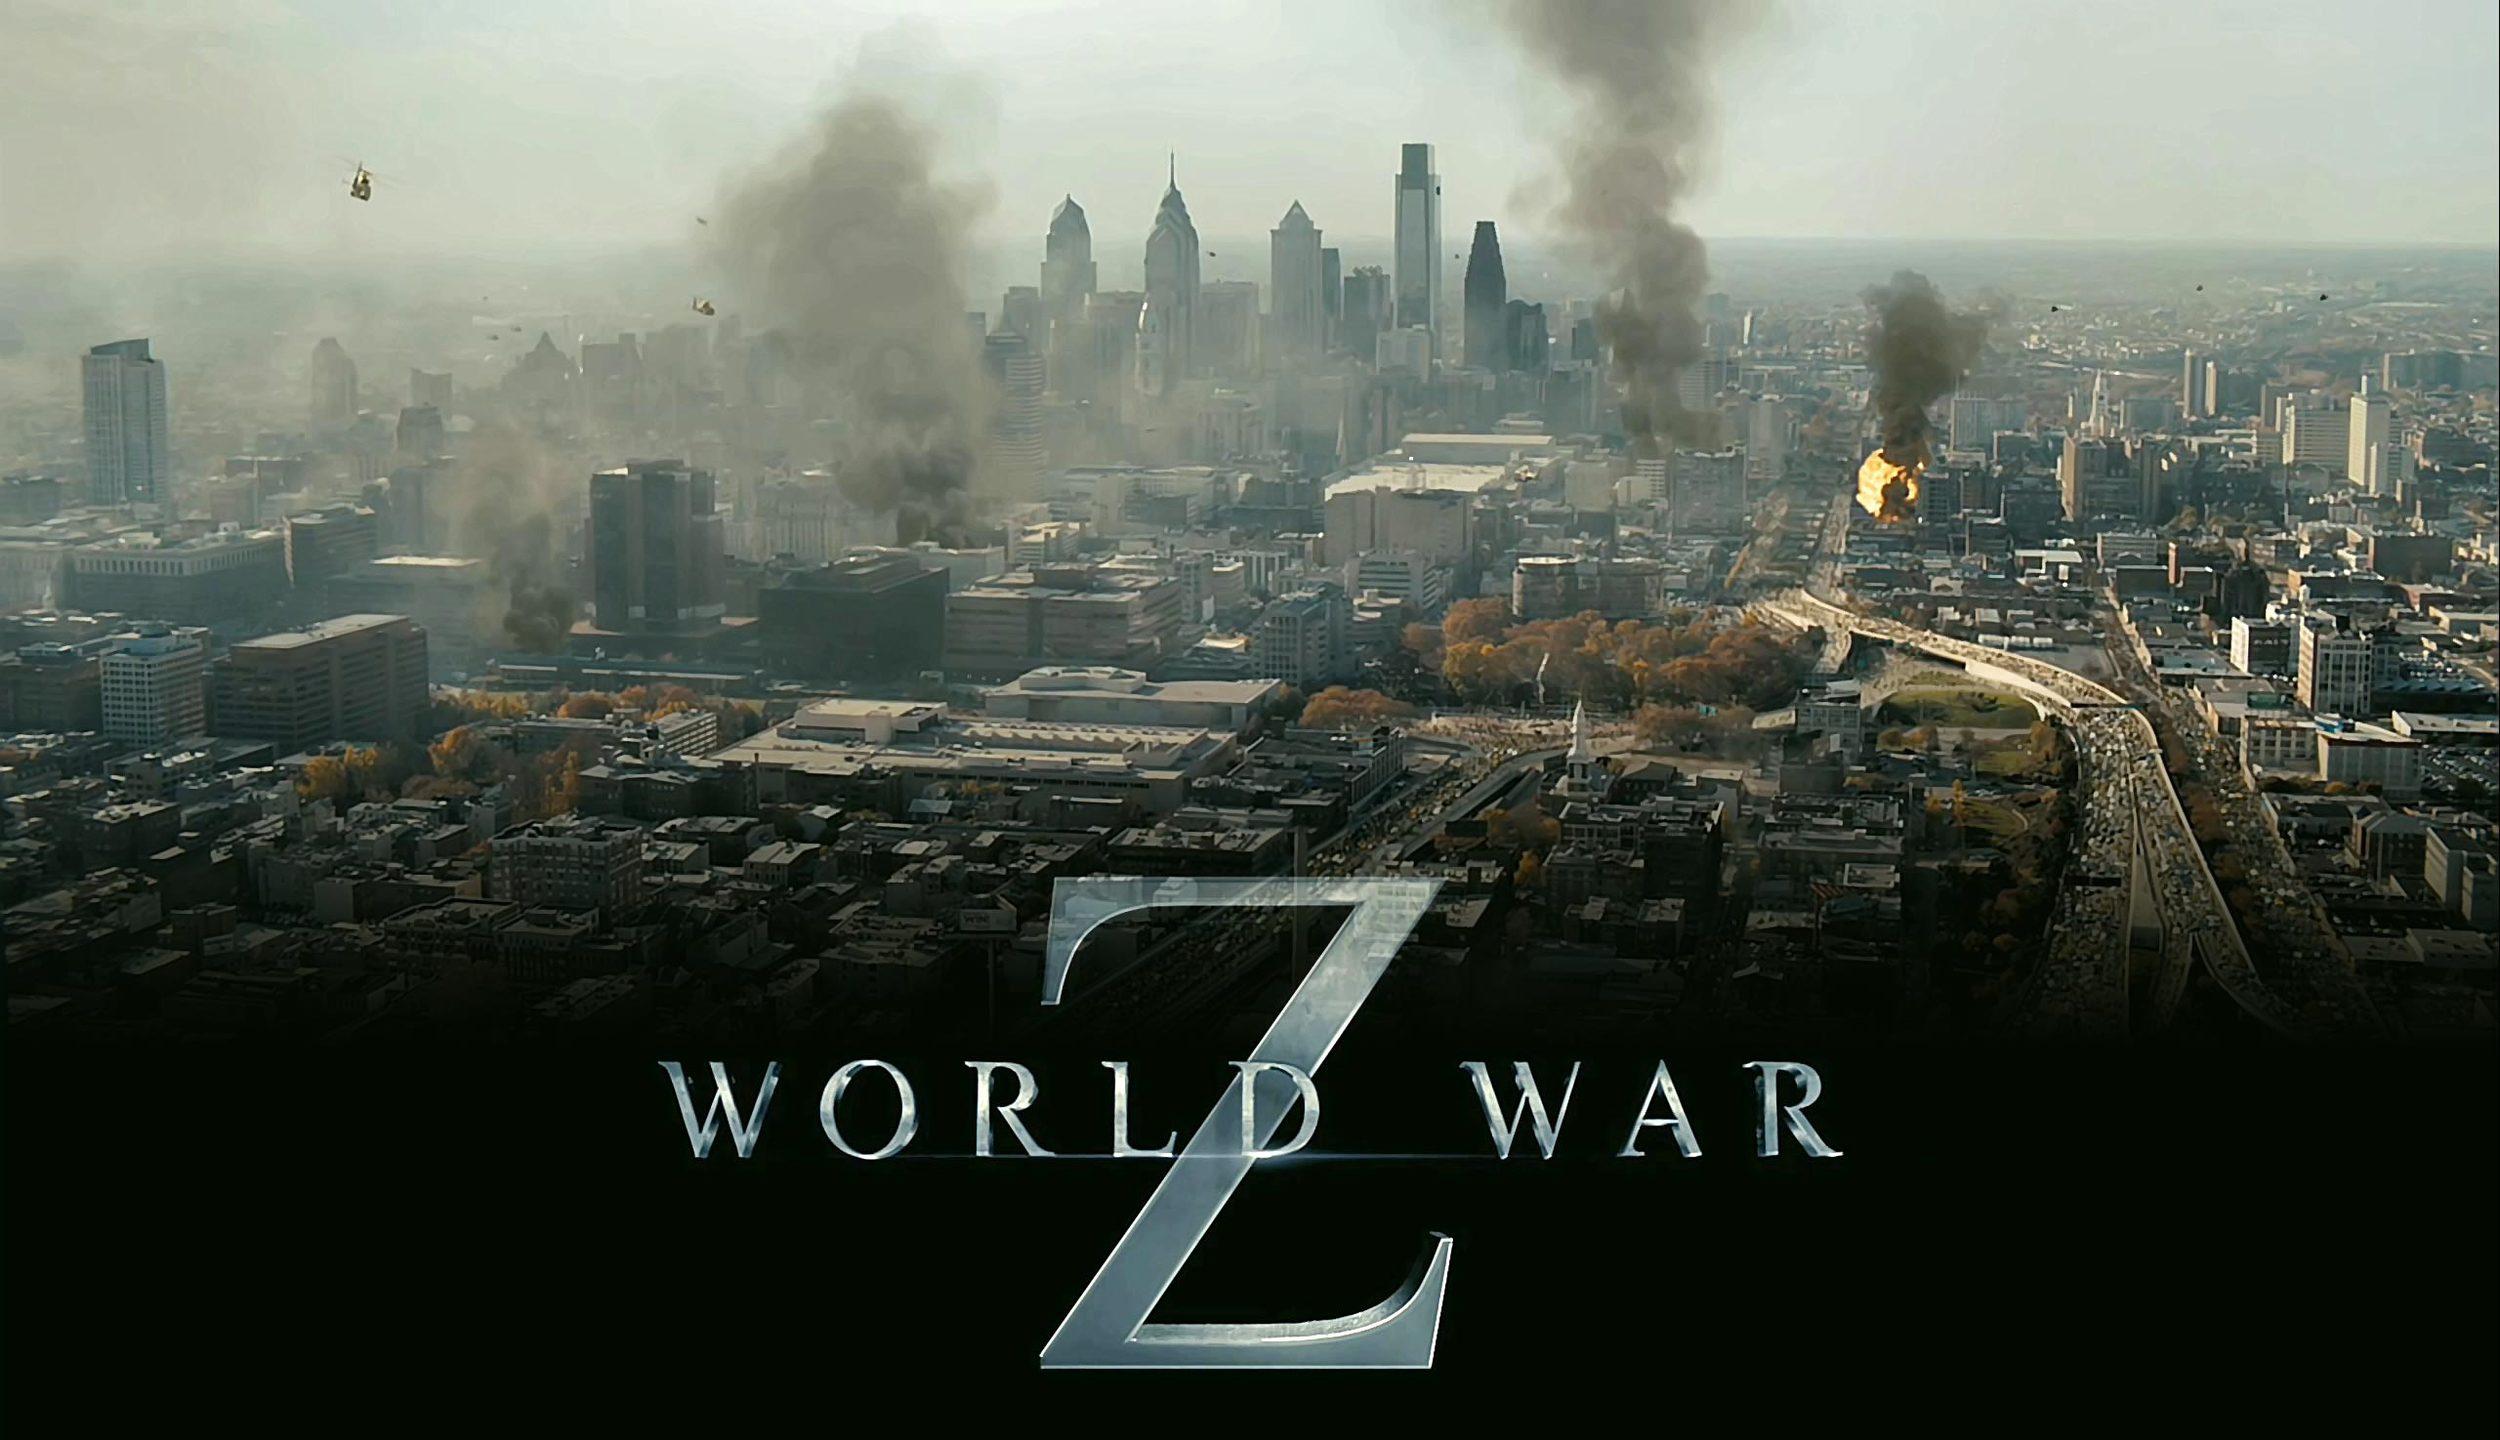 world-war-z1.jpg